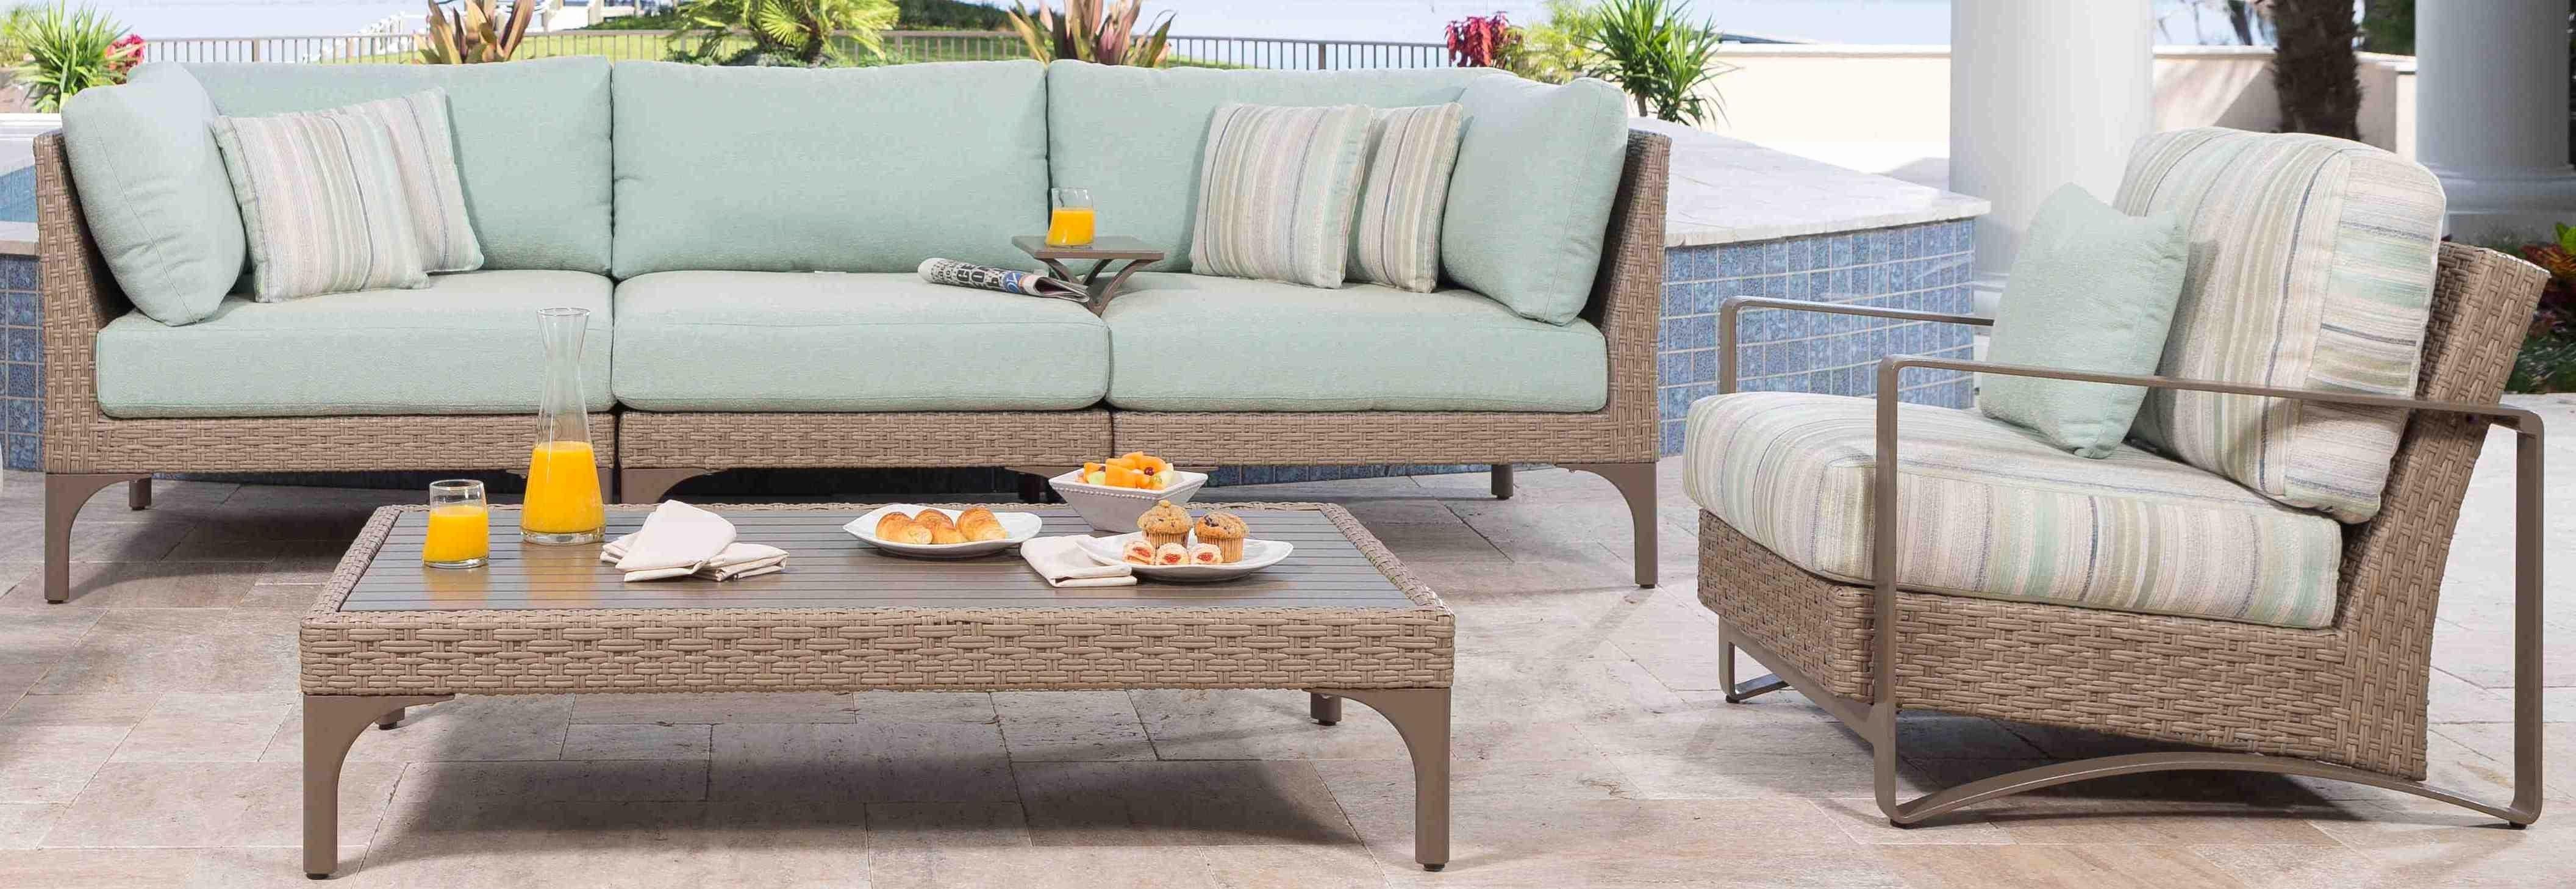 2018 Nfm Patio Conversation Sets Regarding Ebel Patio Furniture (View 12 of 15)